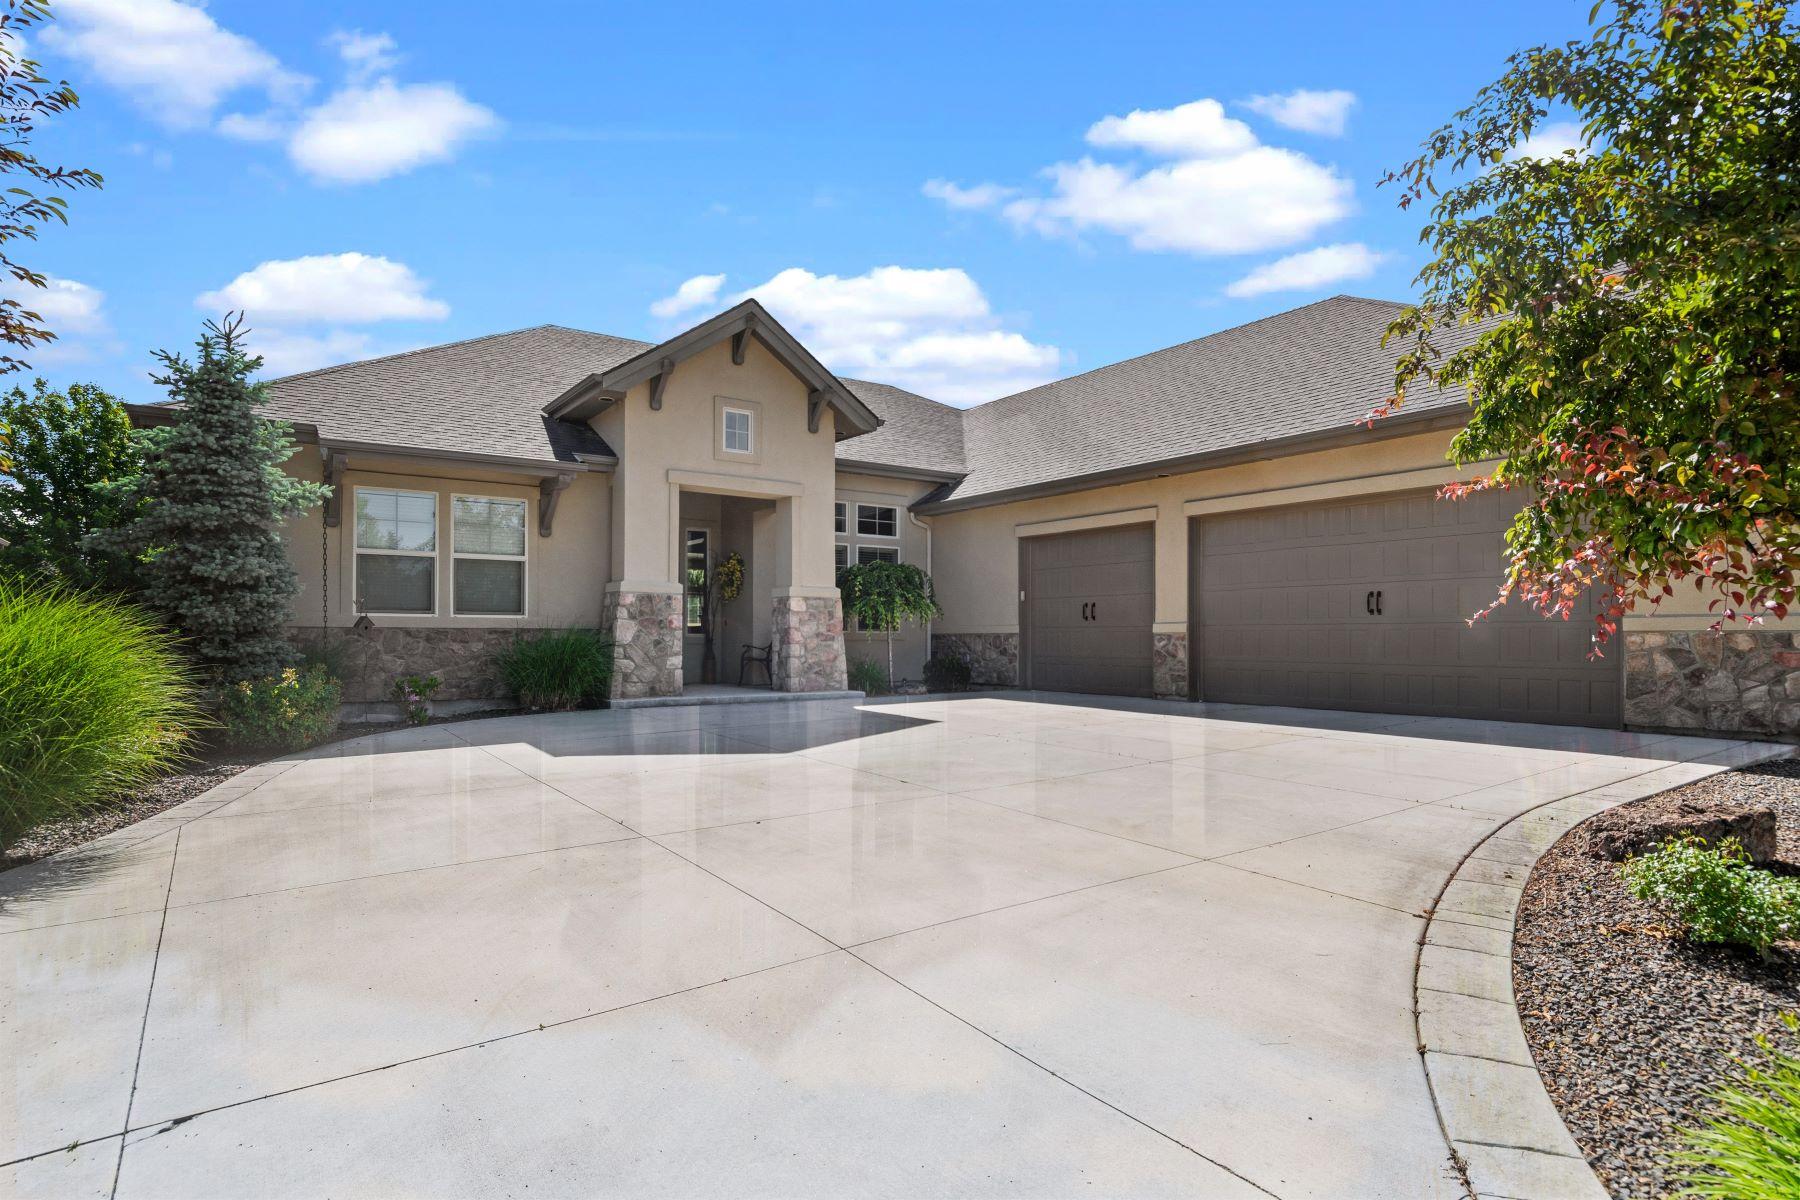 Single Family Homes pour l Vente à 4159 Greenspire Dr., Meridian 4159 W Greenspire Dr Meridian, Idaho 83646 États-Unis